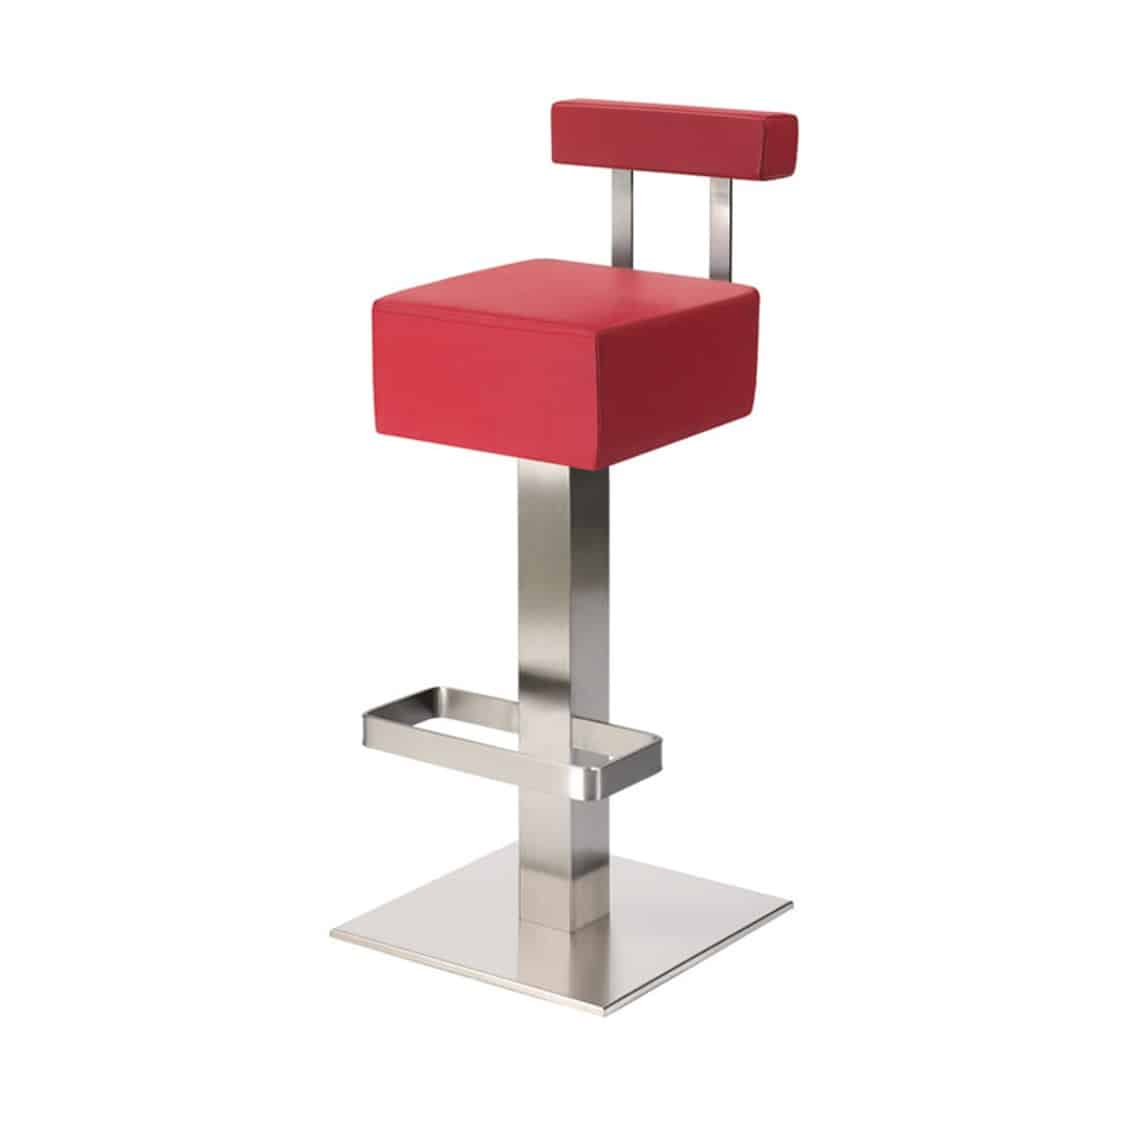 Dice Bar Stool HX 4447 Pedrali at DeFrae Contract Furniture